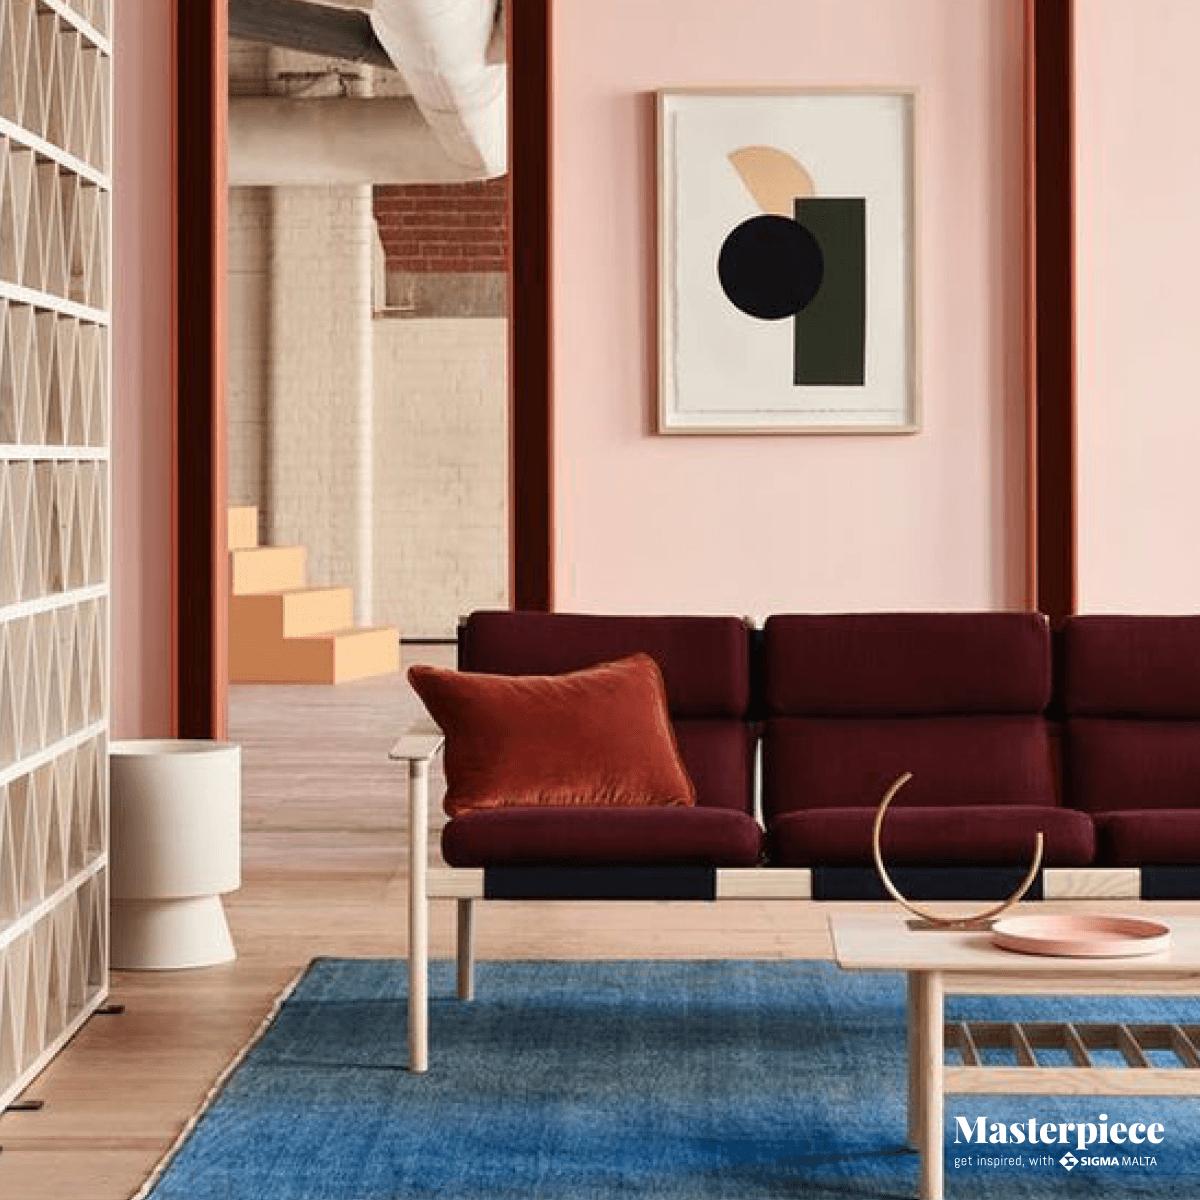 Bauhaus concepts</br><span>brought to life</span>